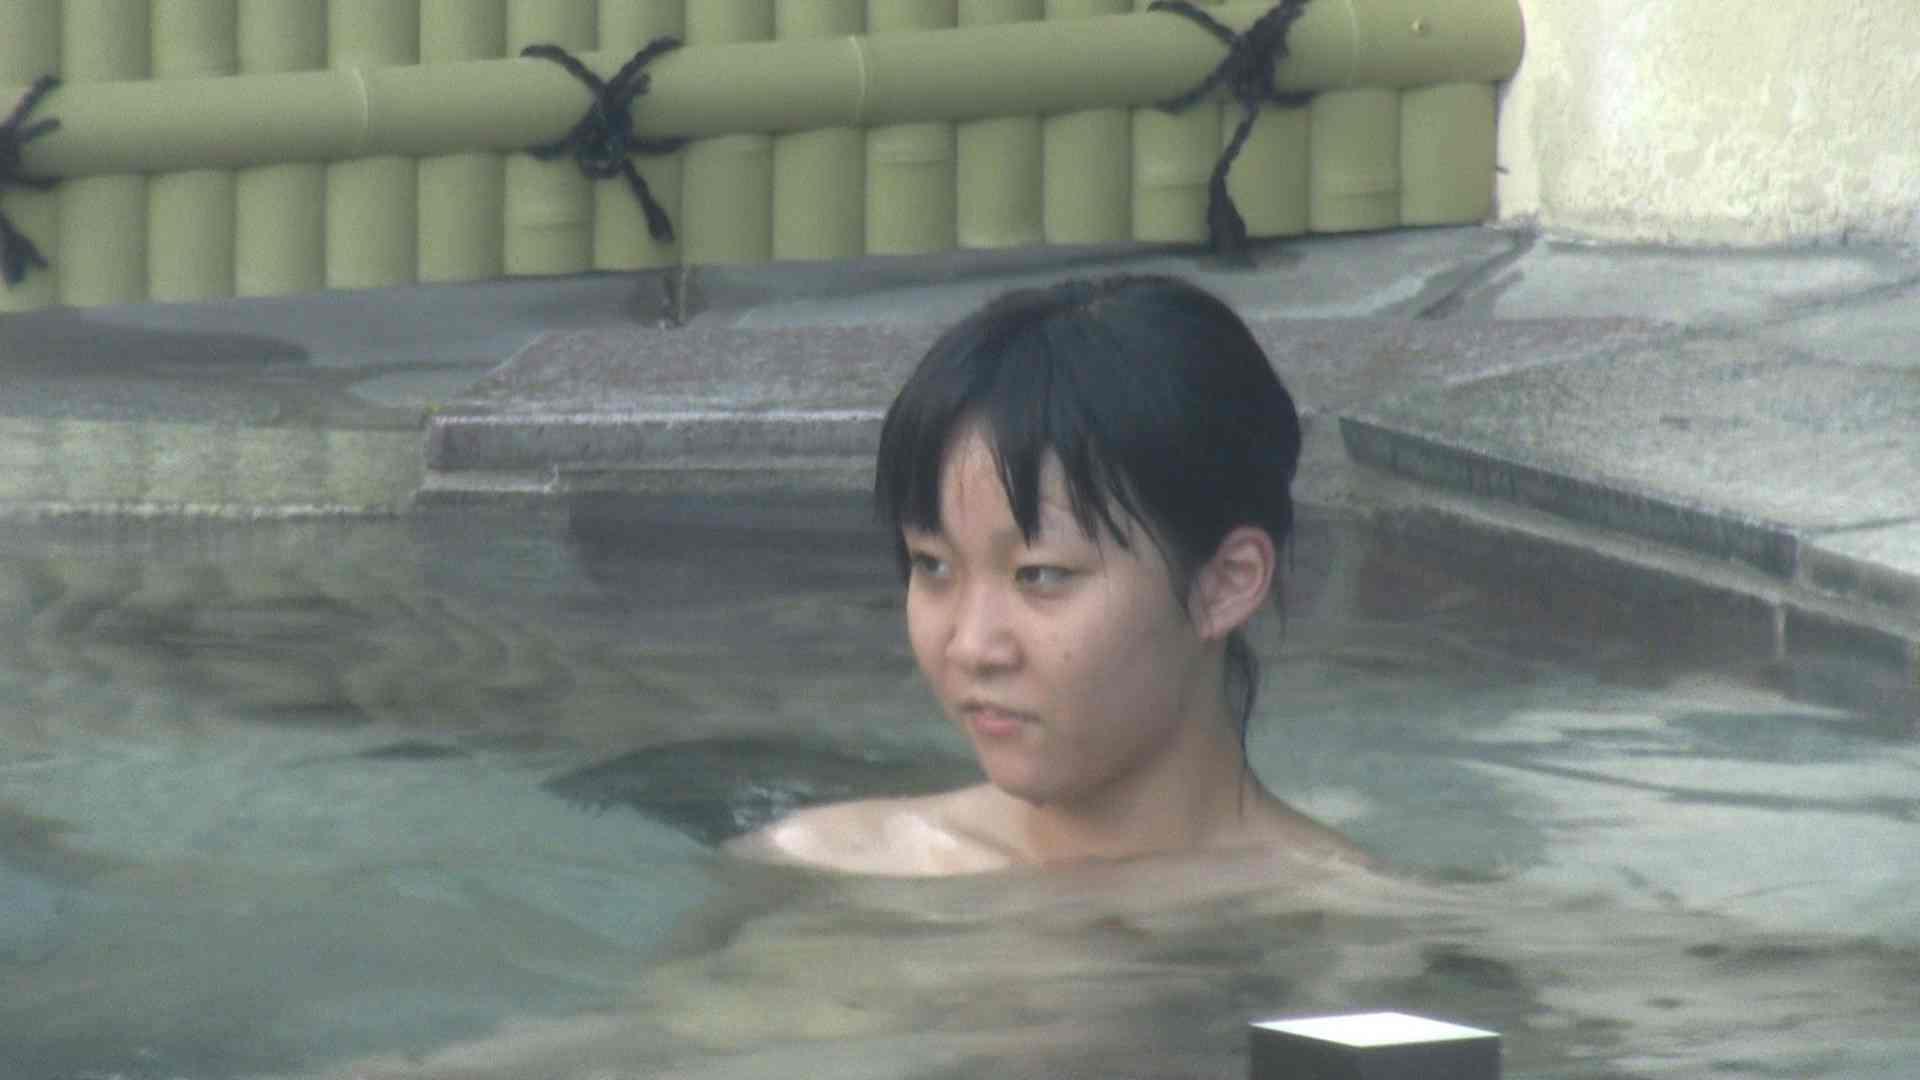 Aquaな露天風呂Vol.196 HなOL | 盗撮  91pic 15